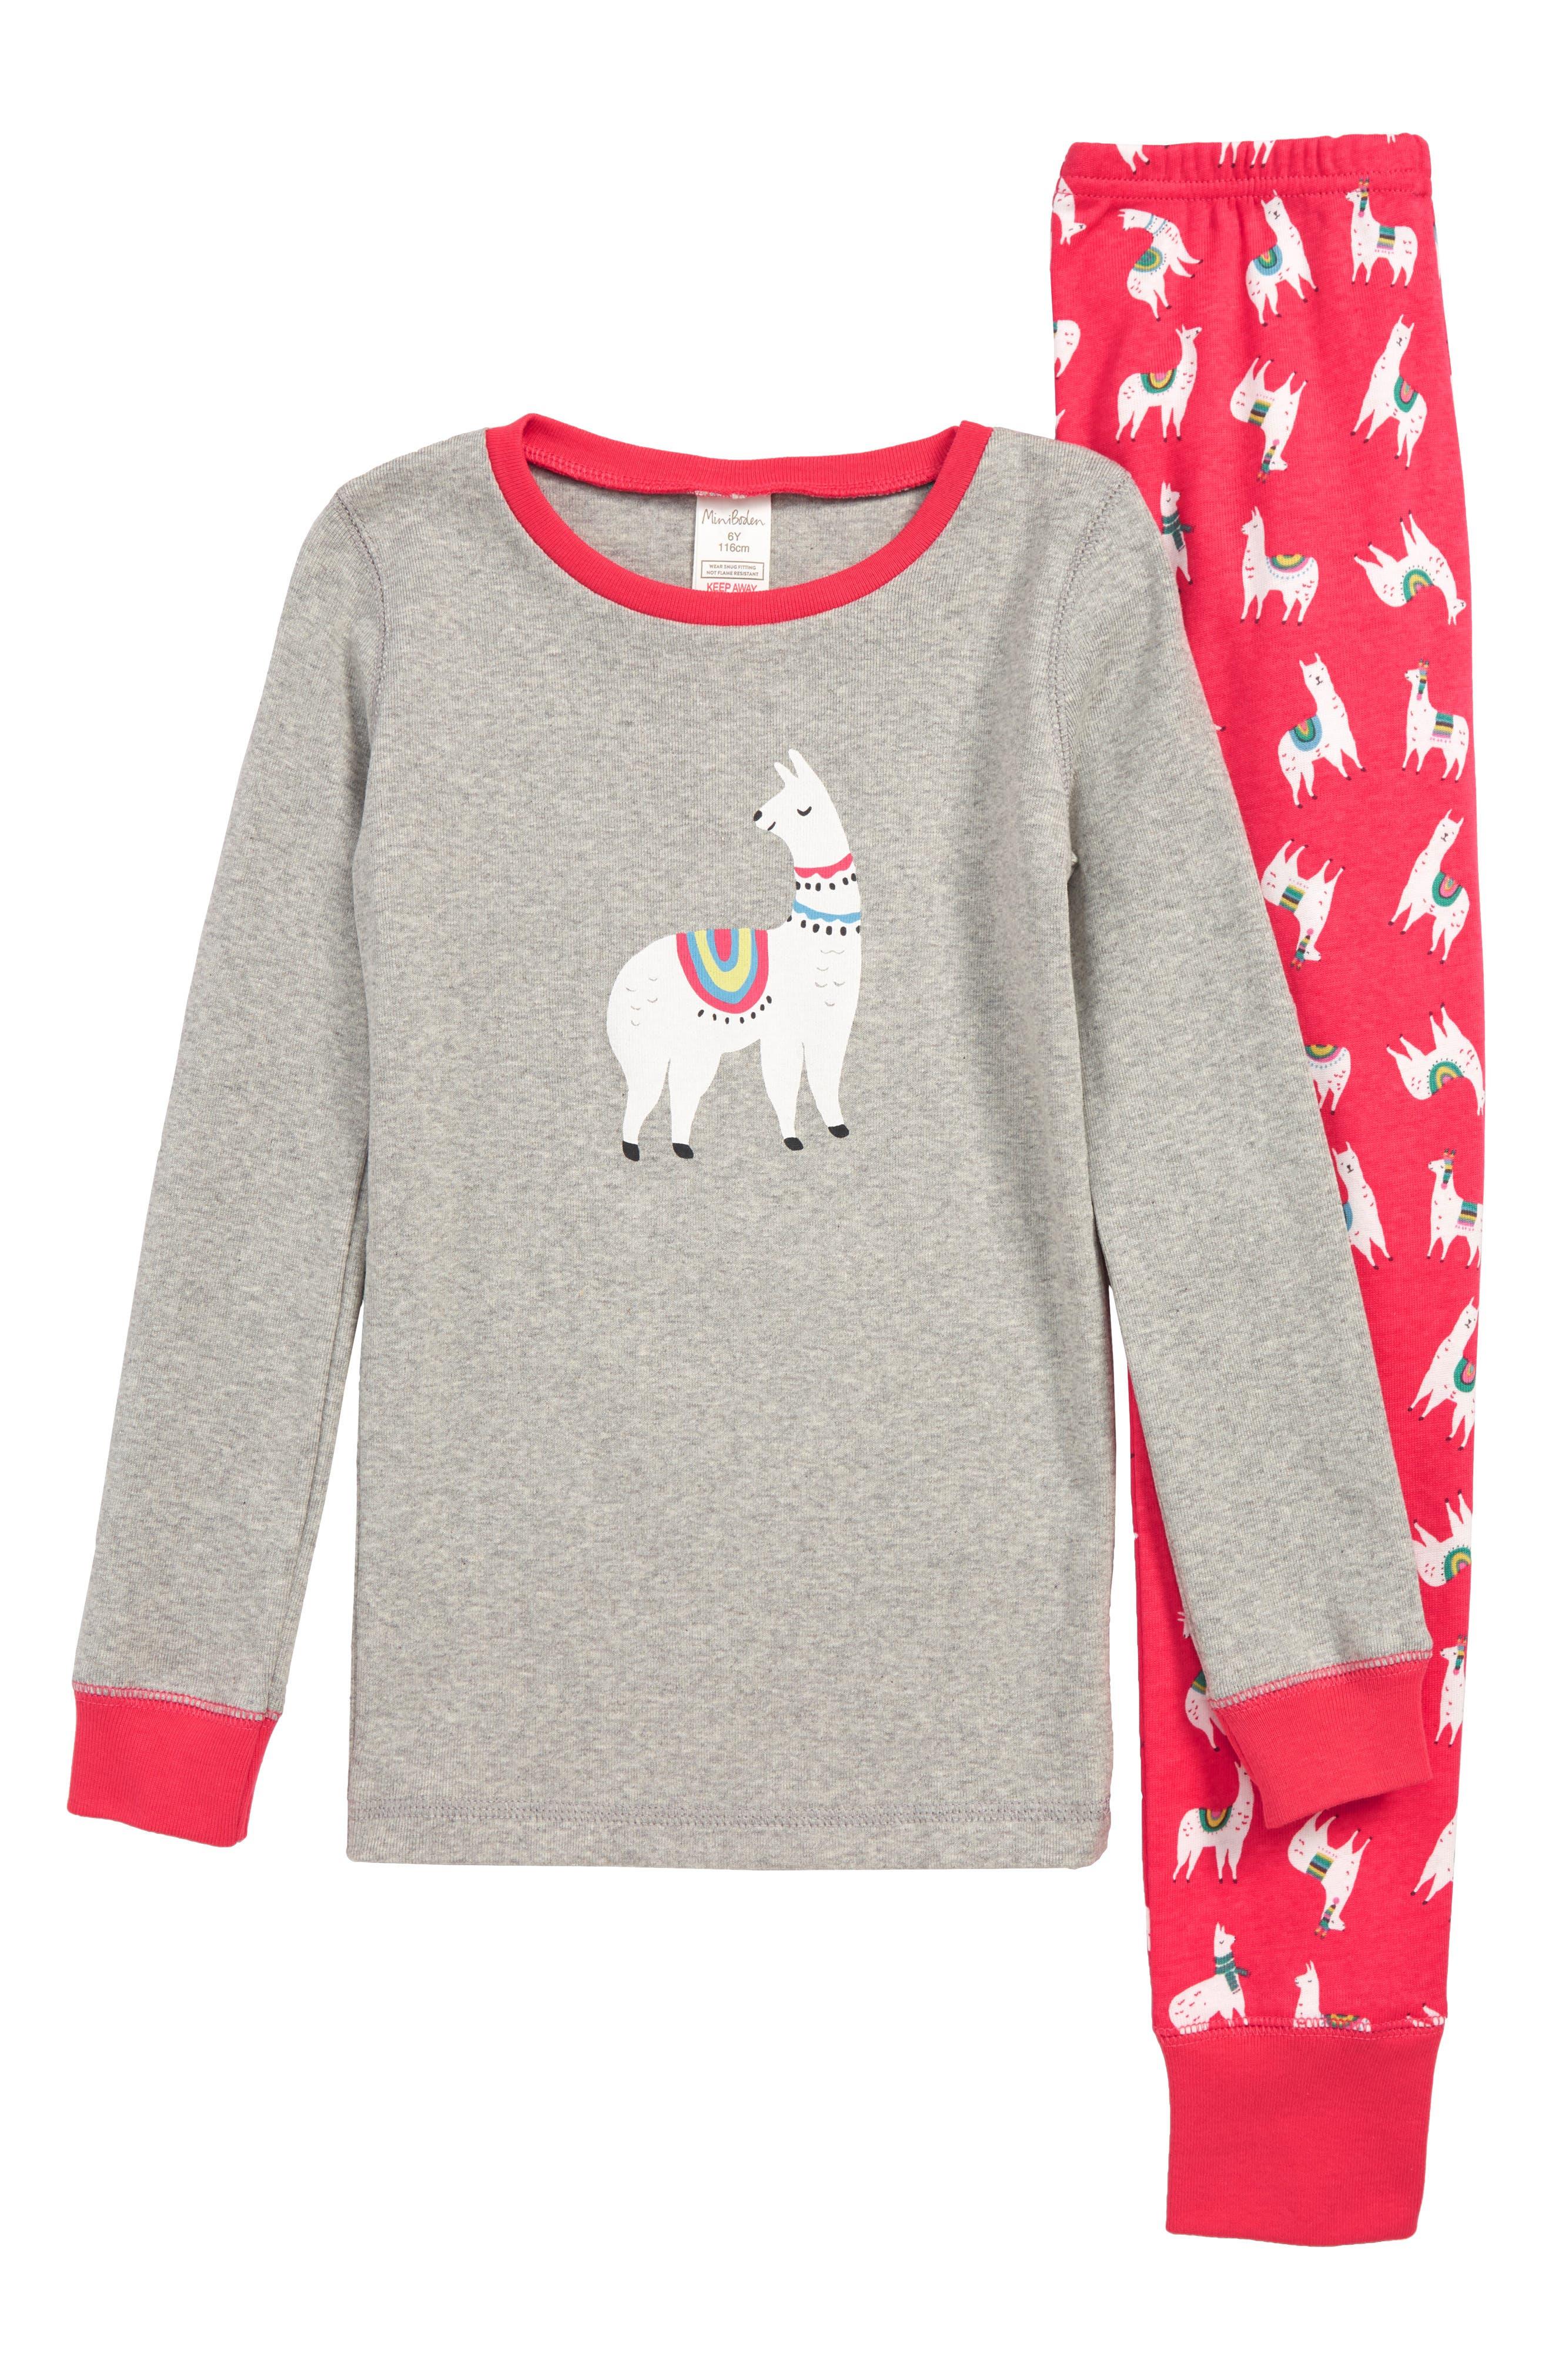 Fitted Cosy Long John Pajamas,                             Main thumbnail 1, color,                             BPK PINK BERRY LLAMAS